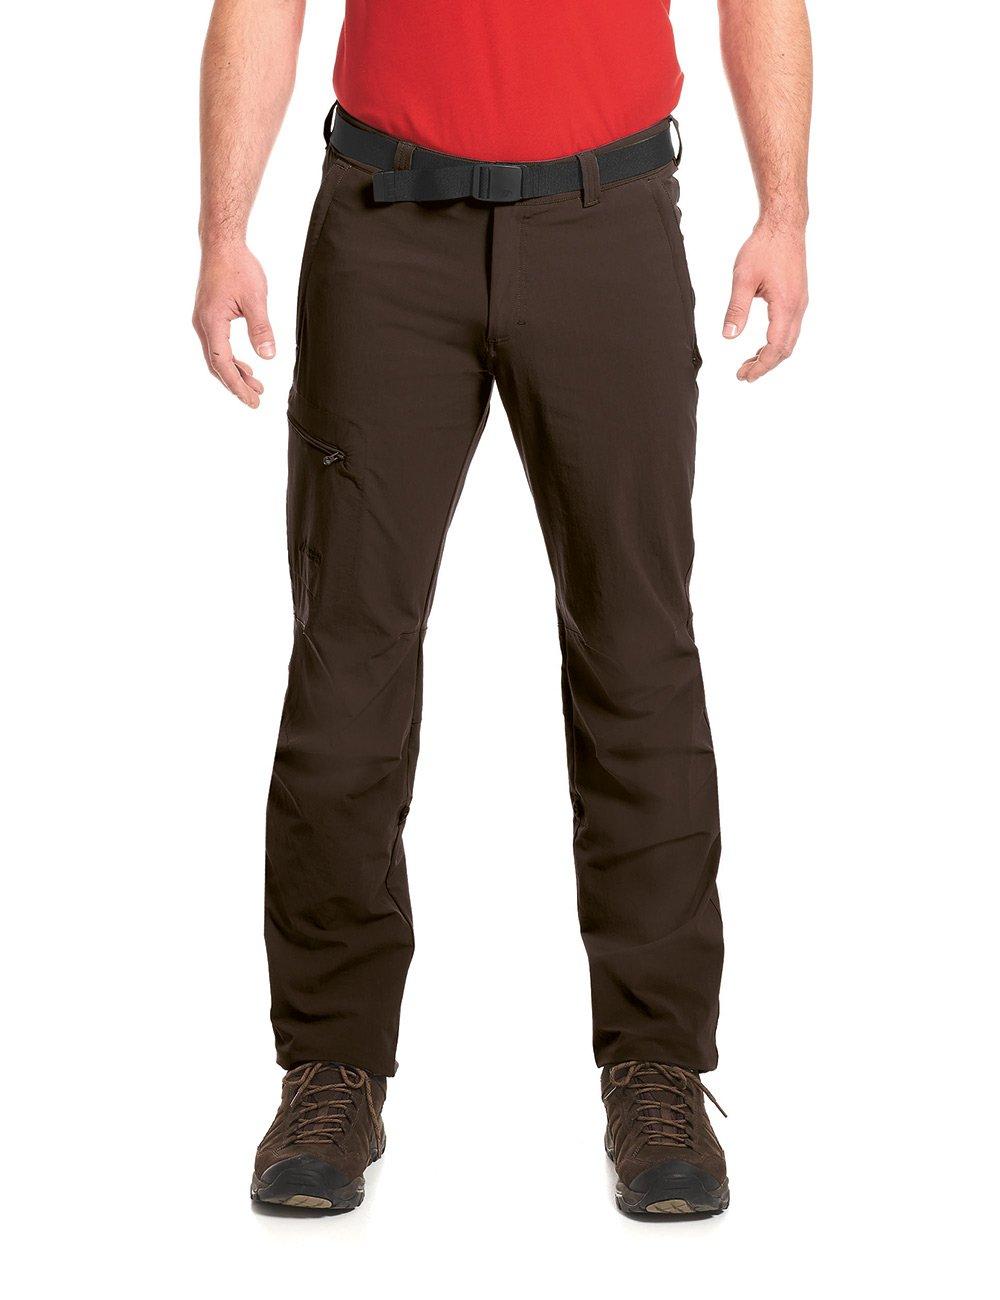 Demitasse  maier sports Nil Pantalon de randonnée